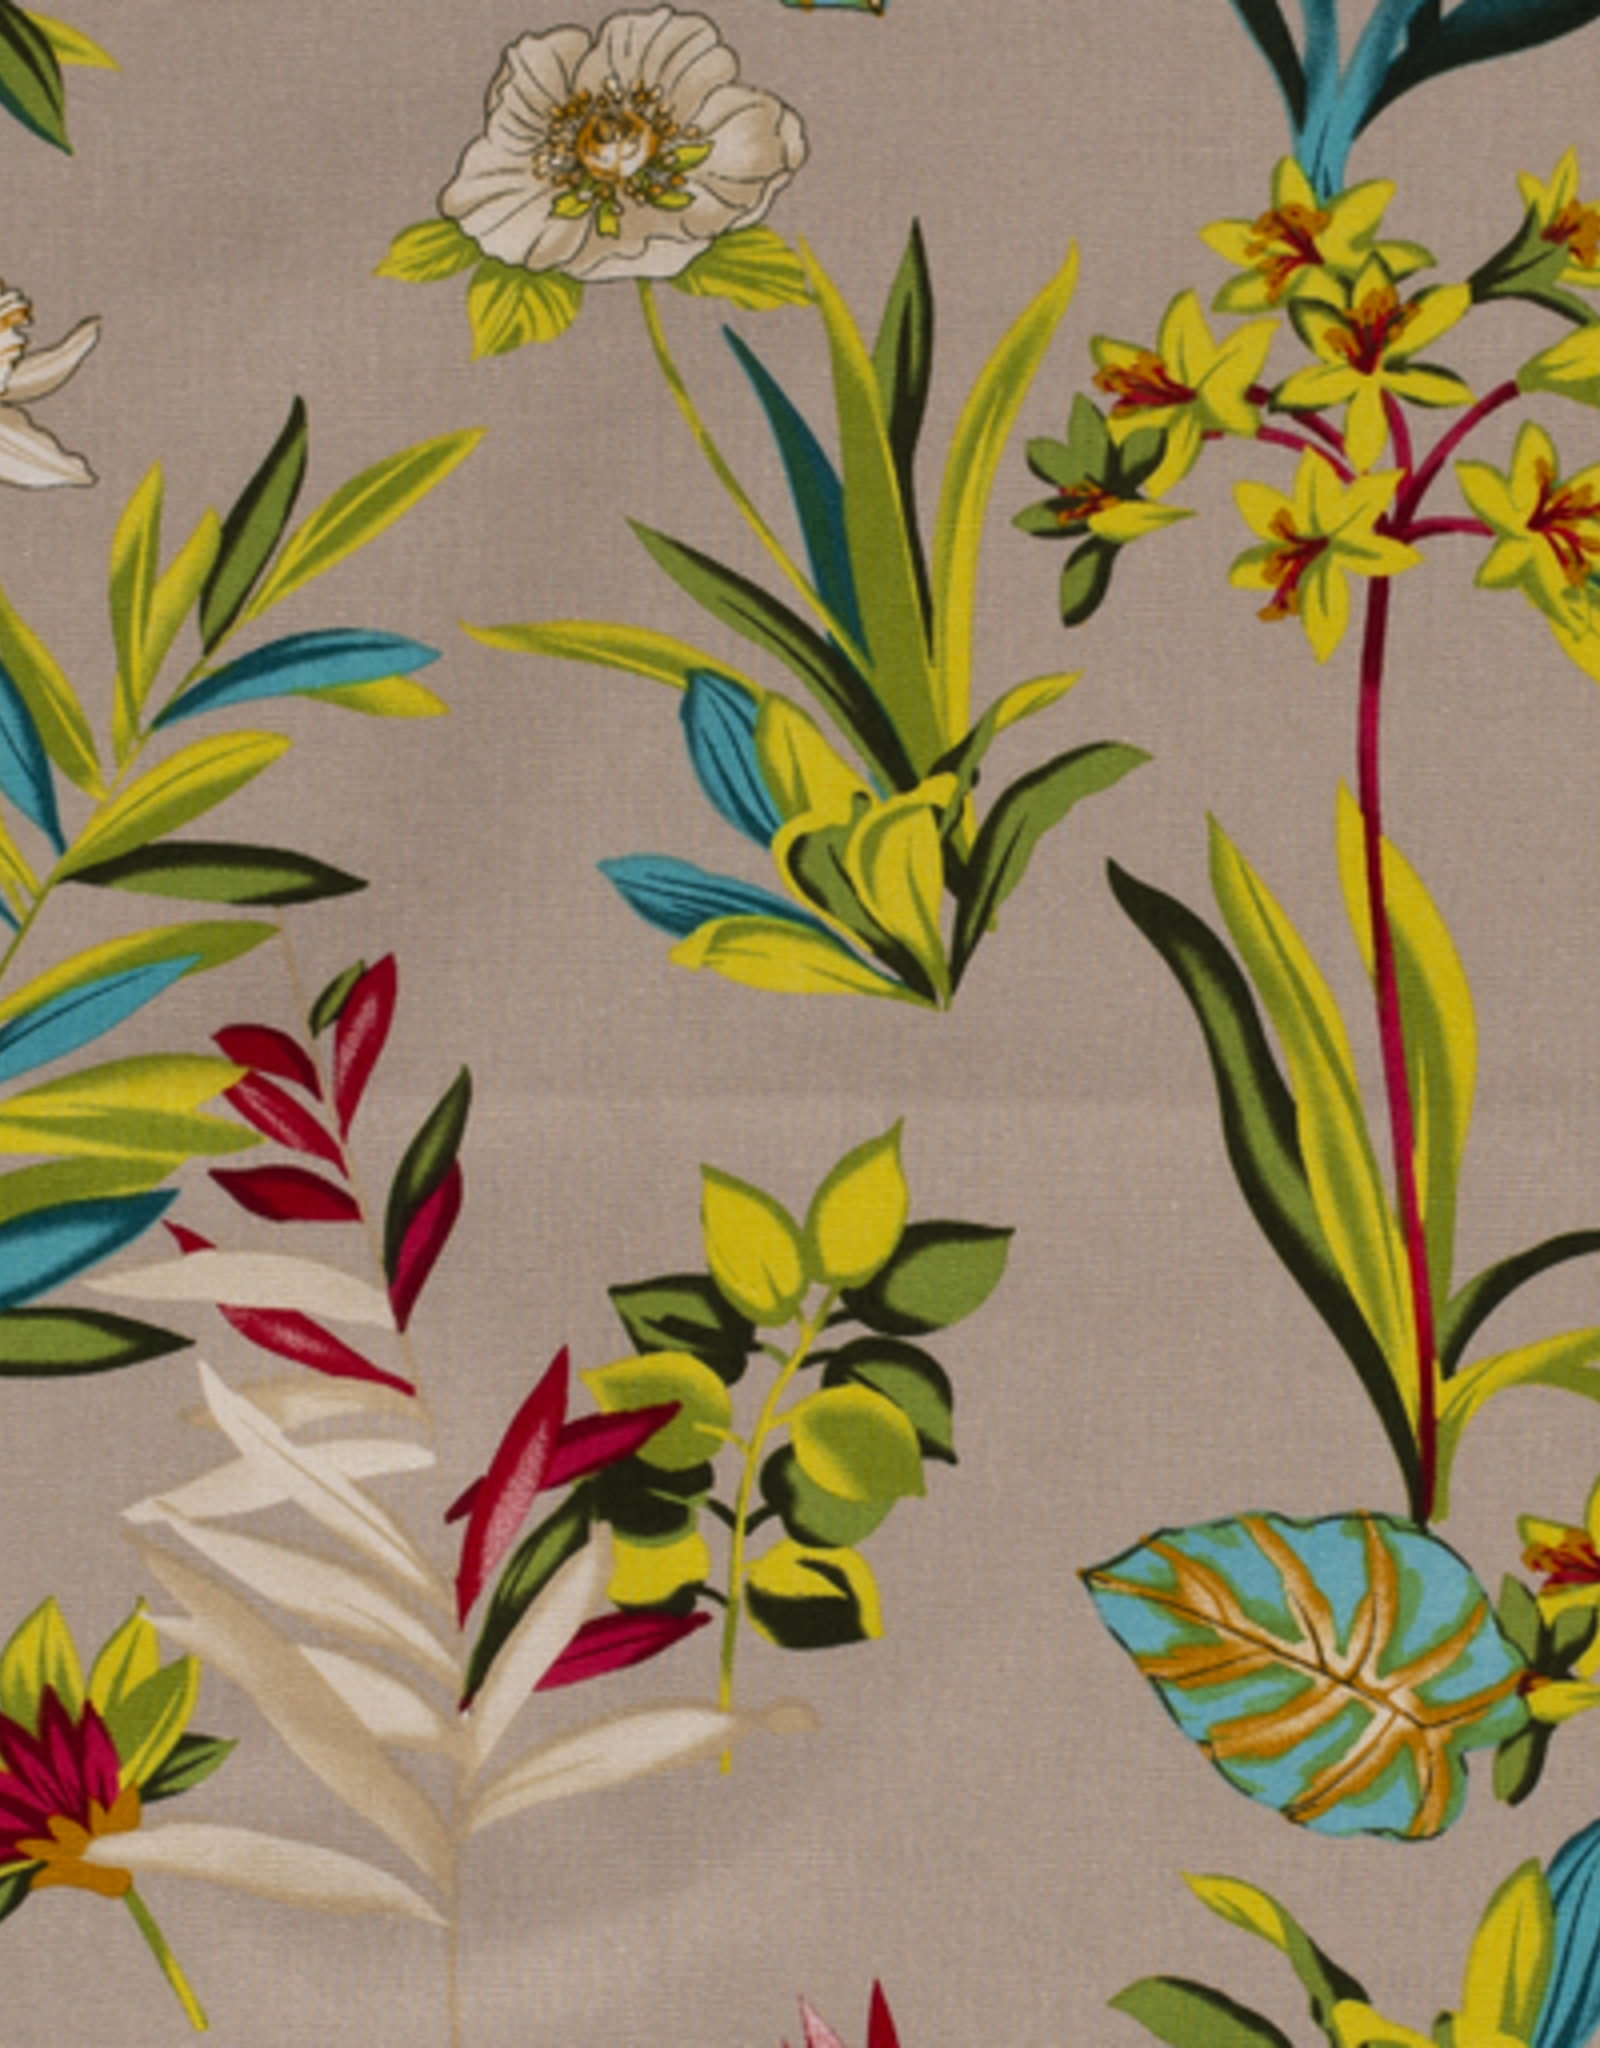 Linnenviscose beige met felle bloemen